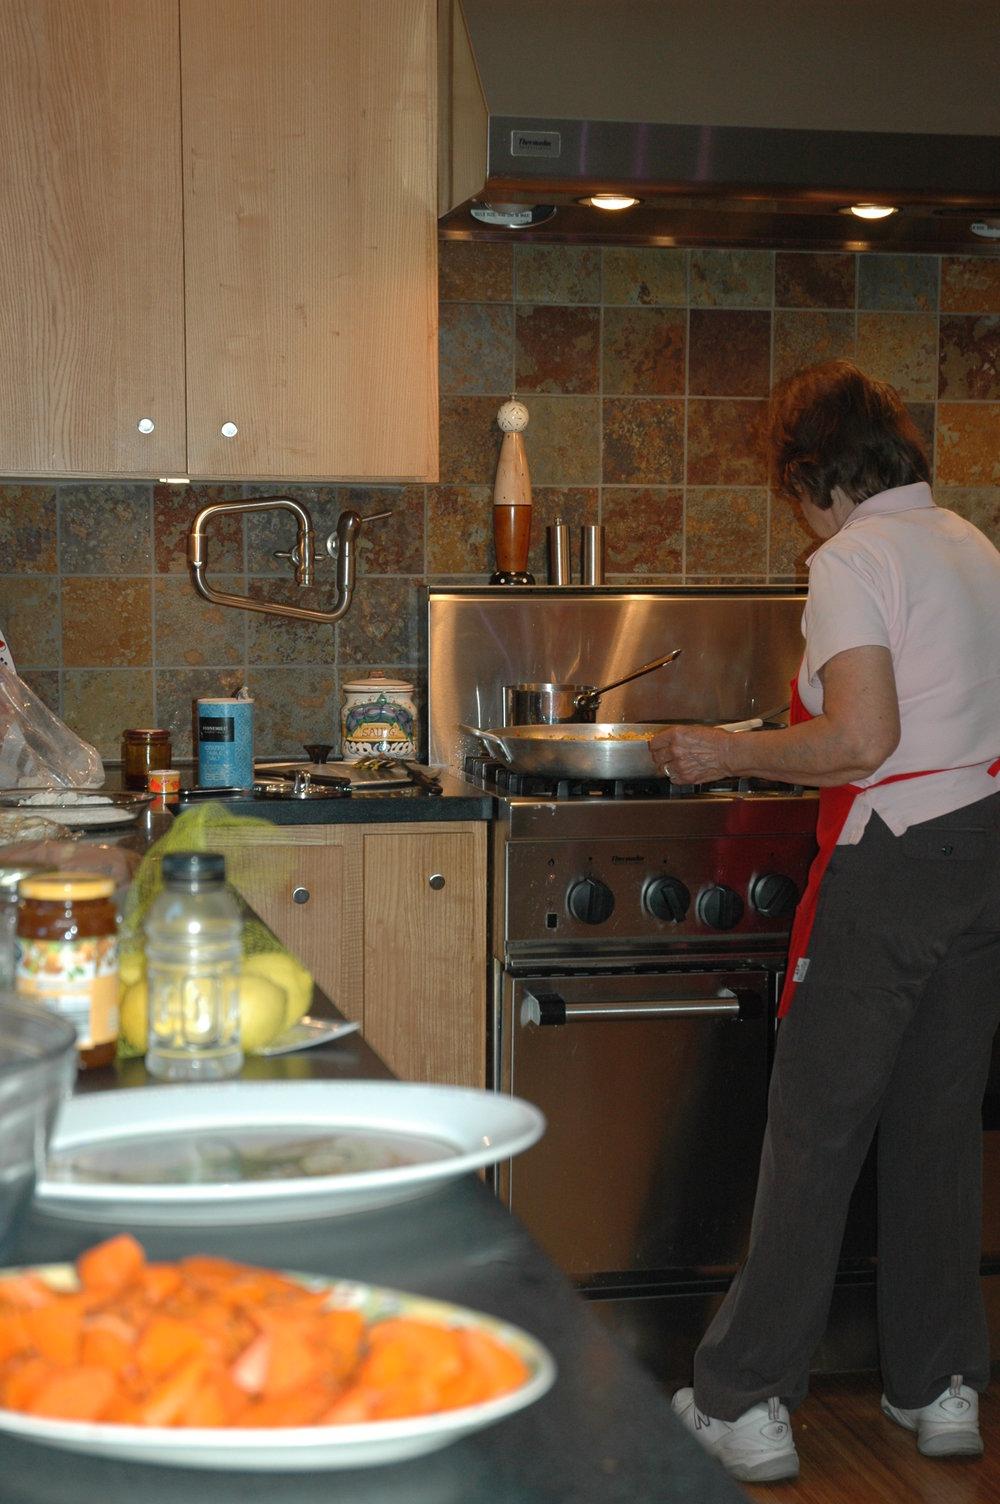 Top Chef_0005.jpg